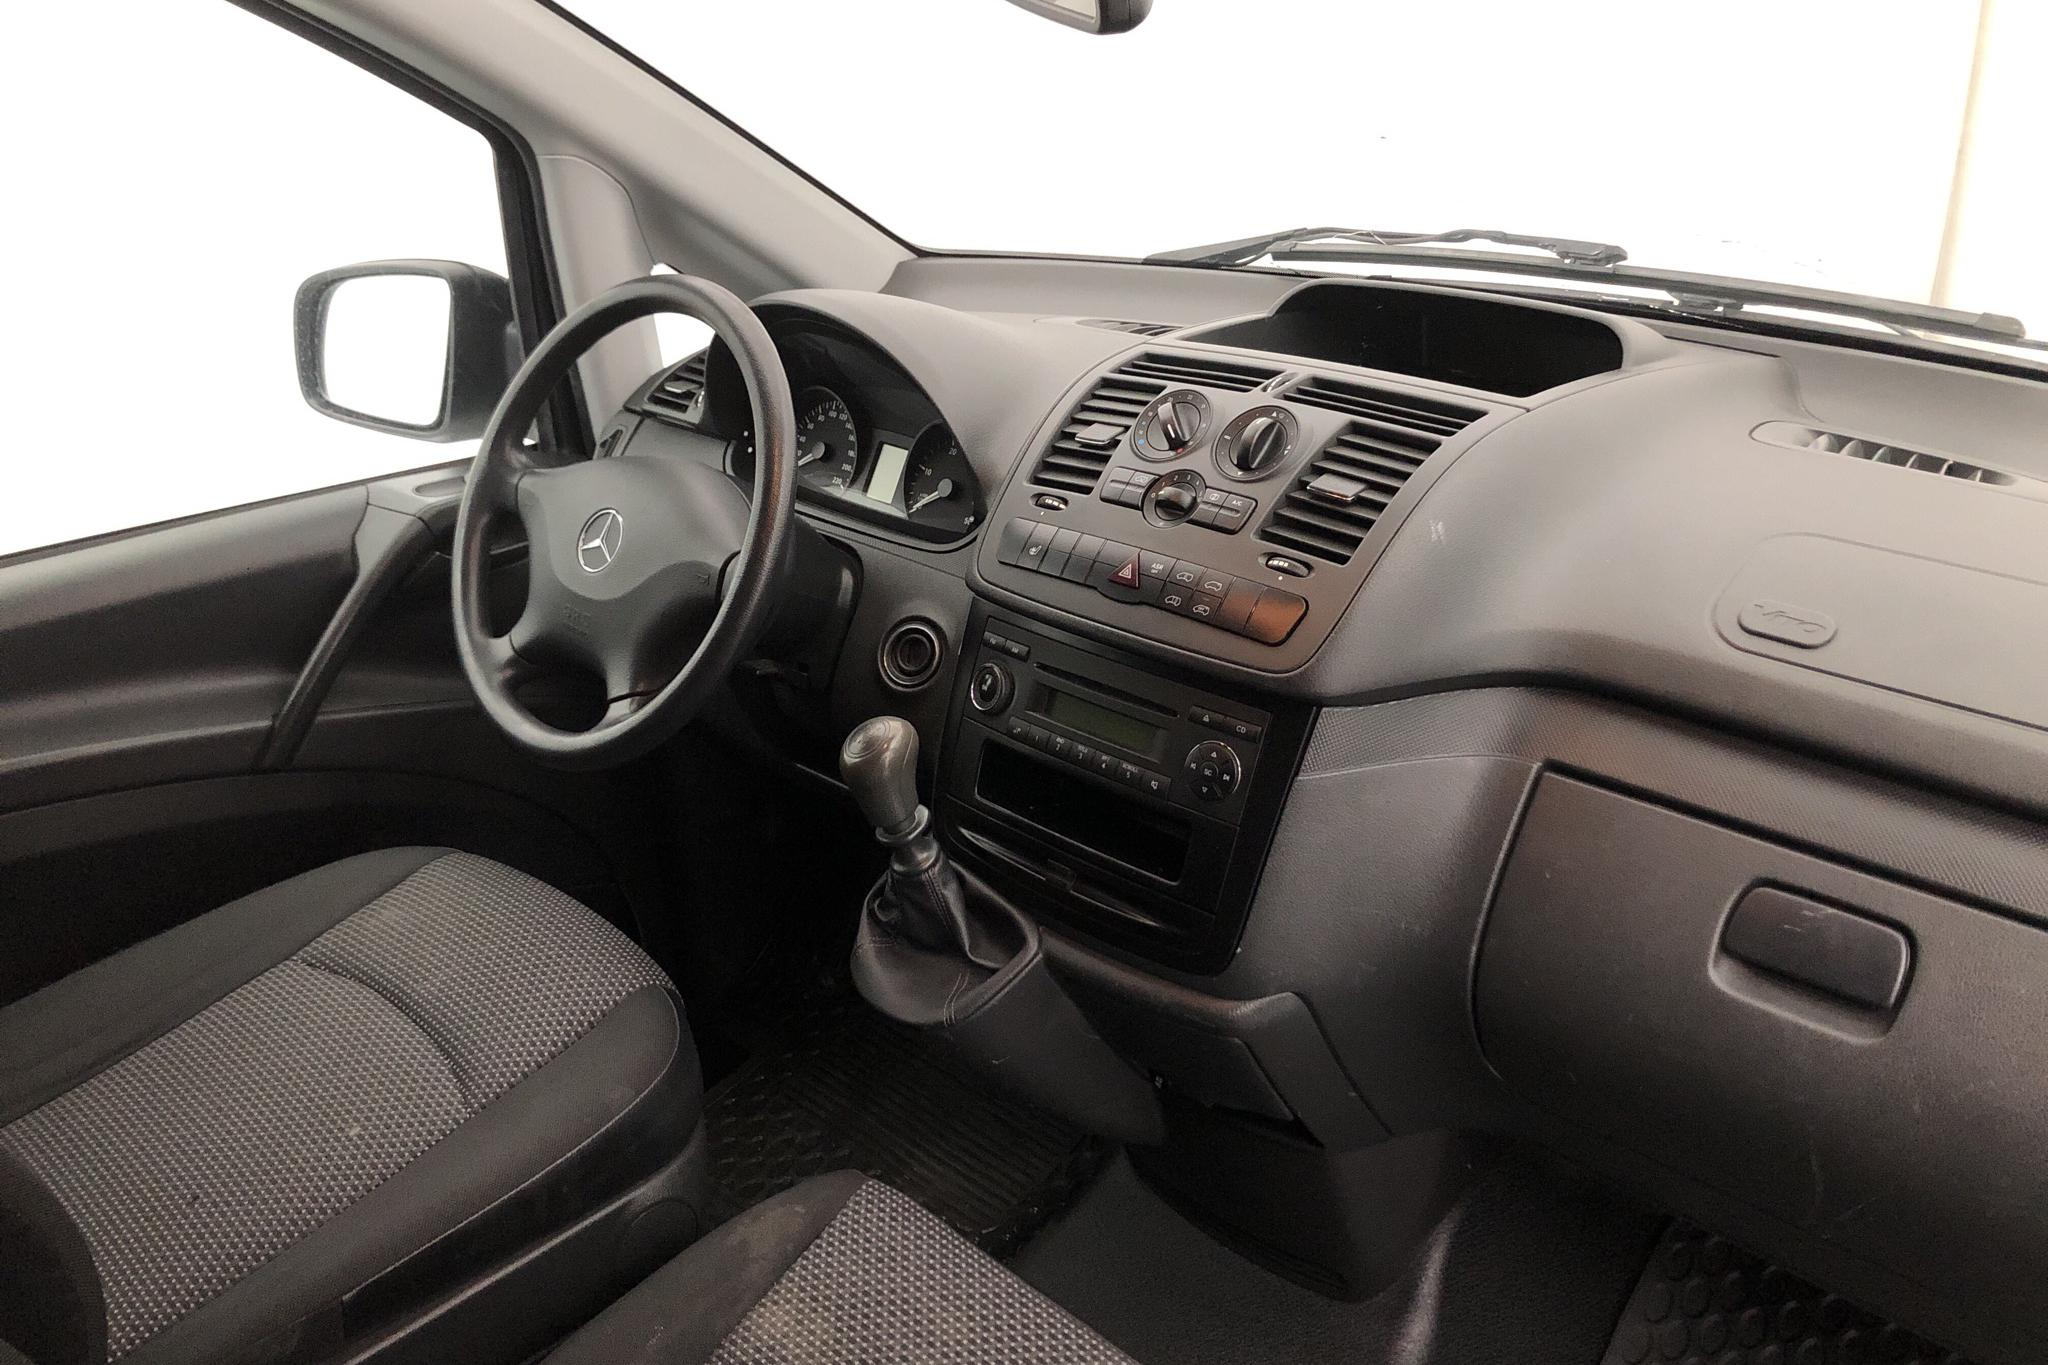 Mercedes Vito 110 CDI W639 (95hk) - 165 090 km - Manual - white - 2015